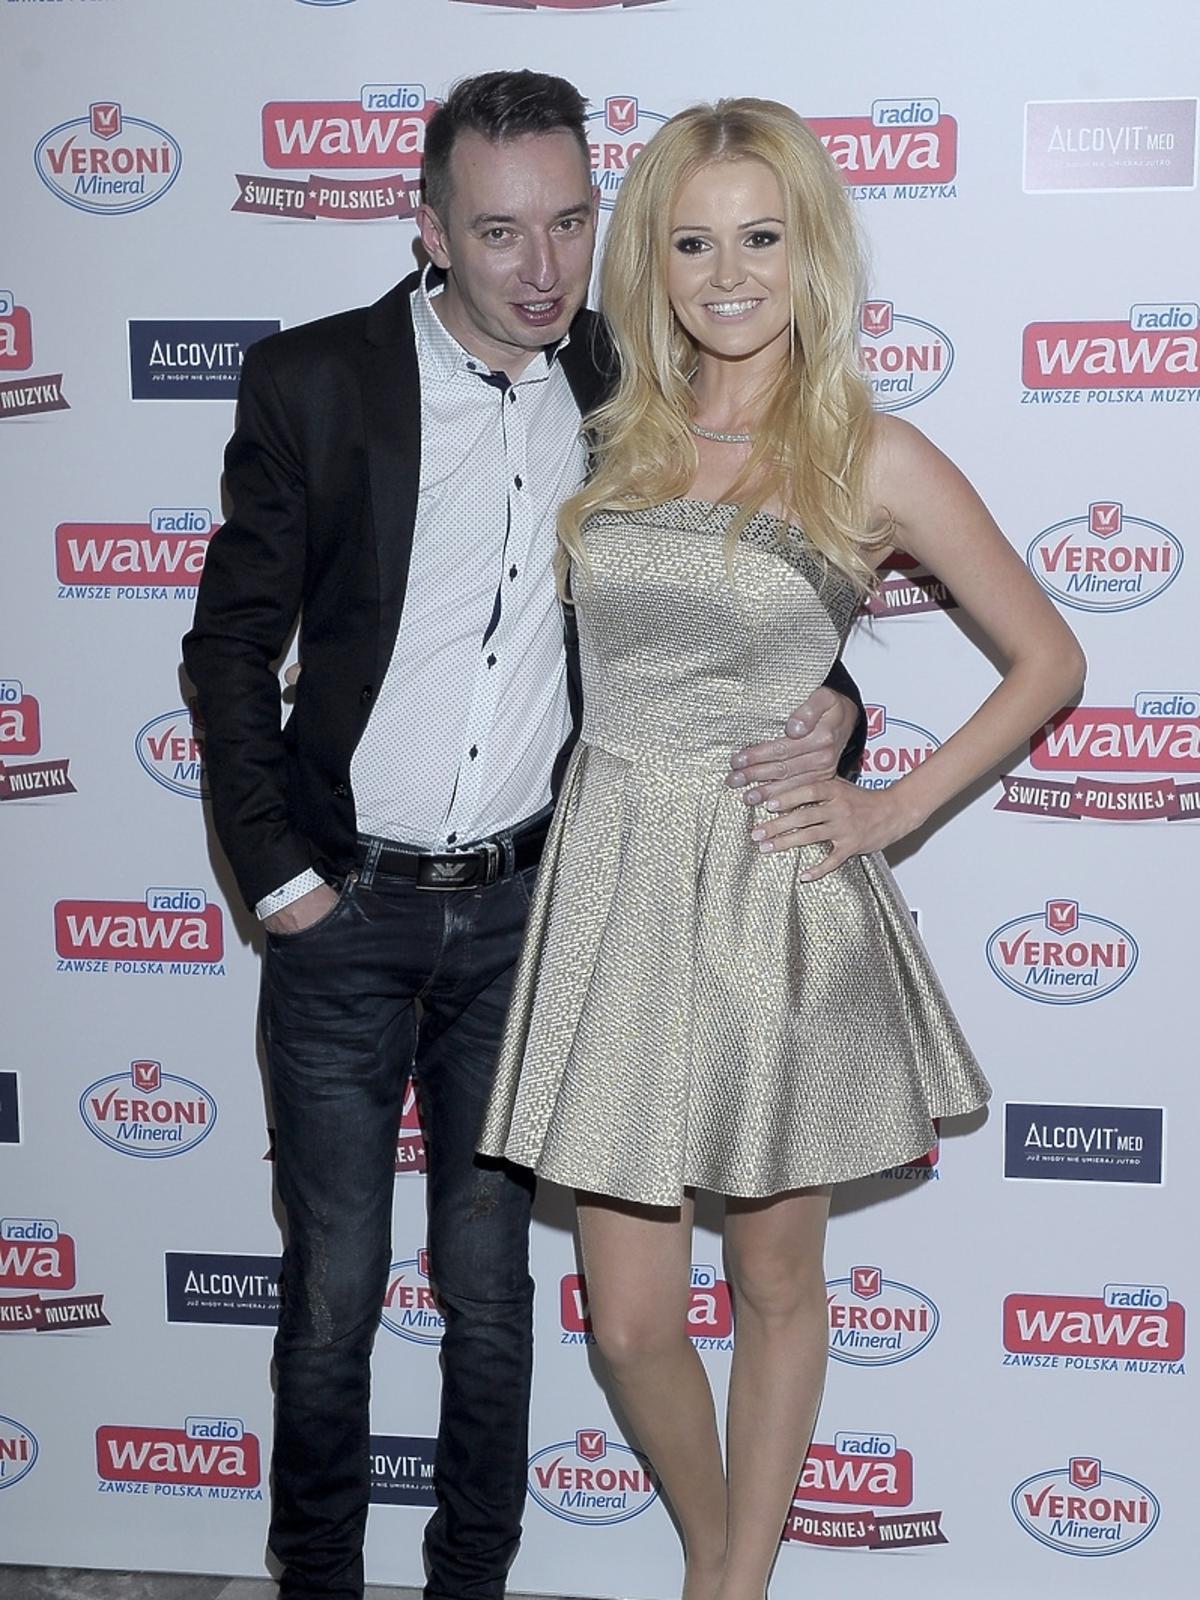 Adam i Angelina Konkol na urodzinach Radia WAWA